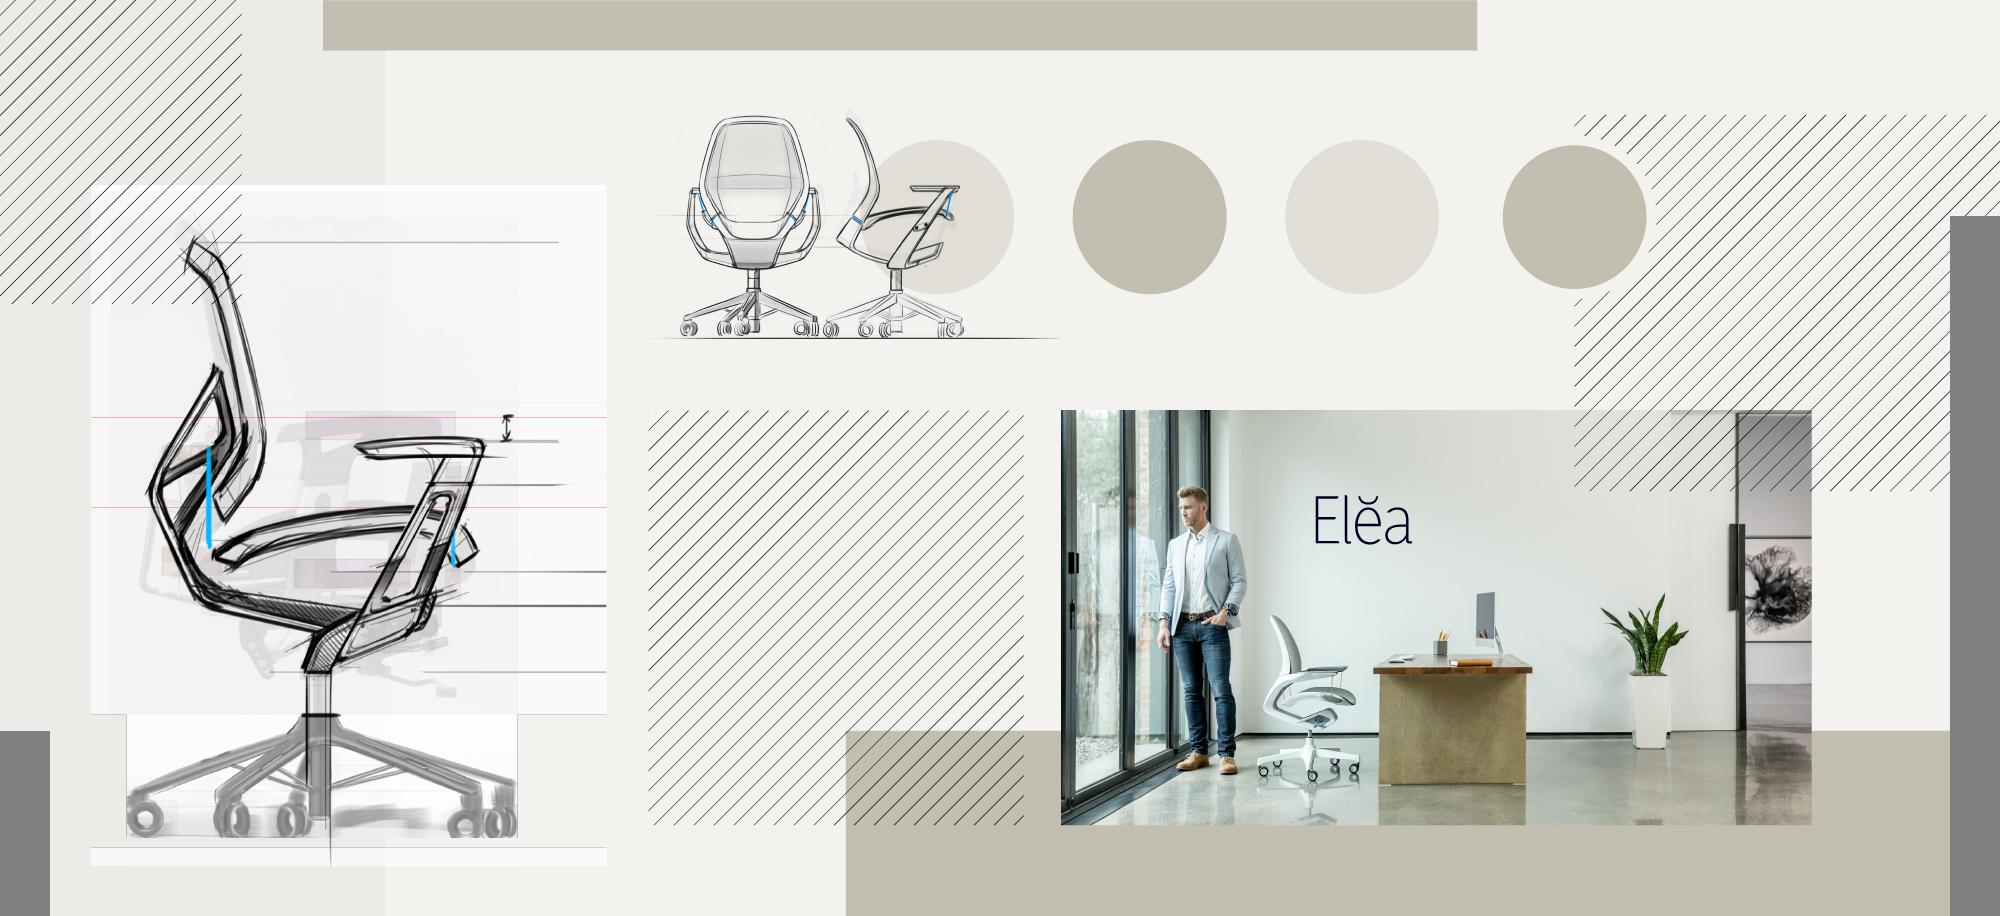 Elea Style Board Mockup